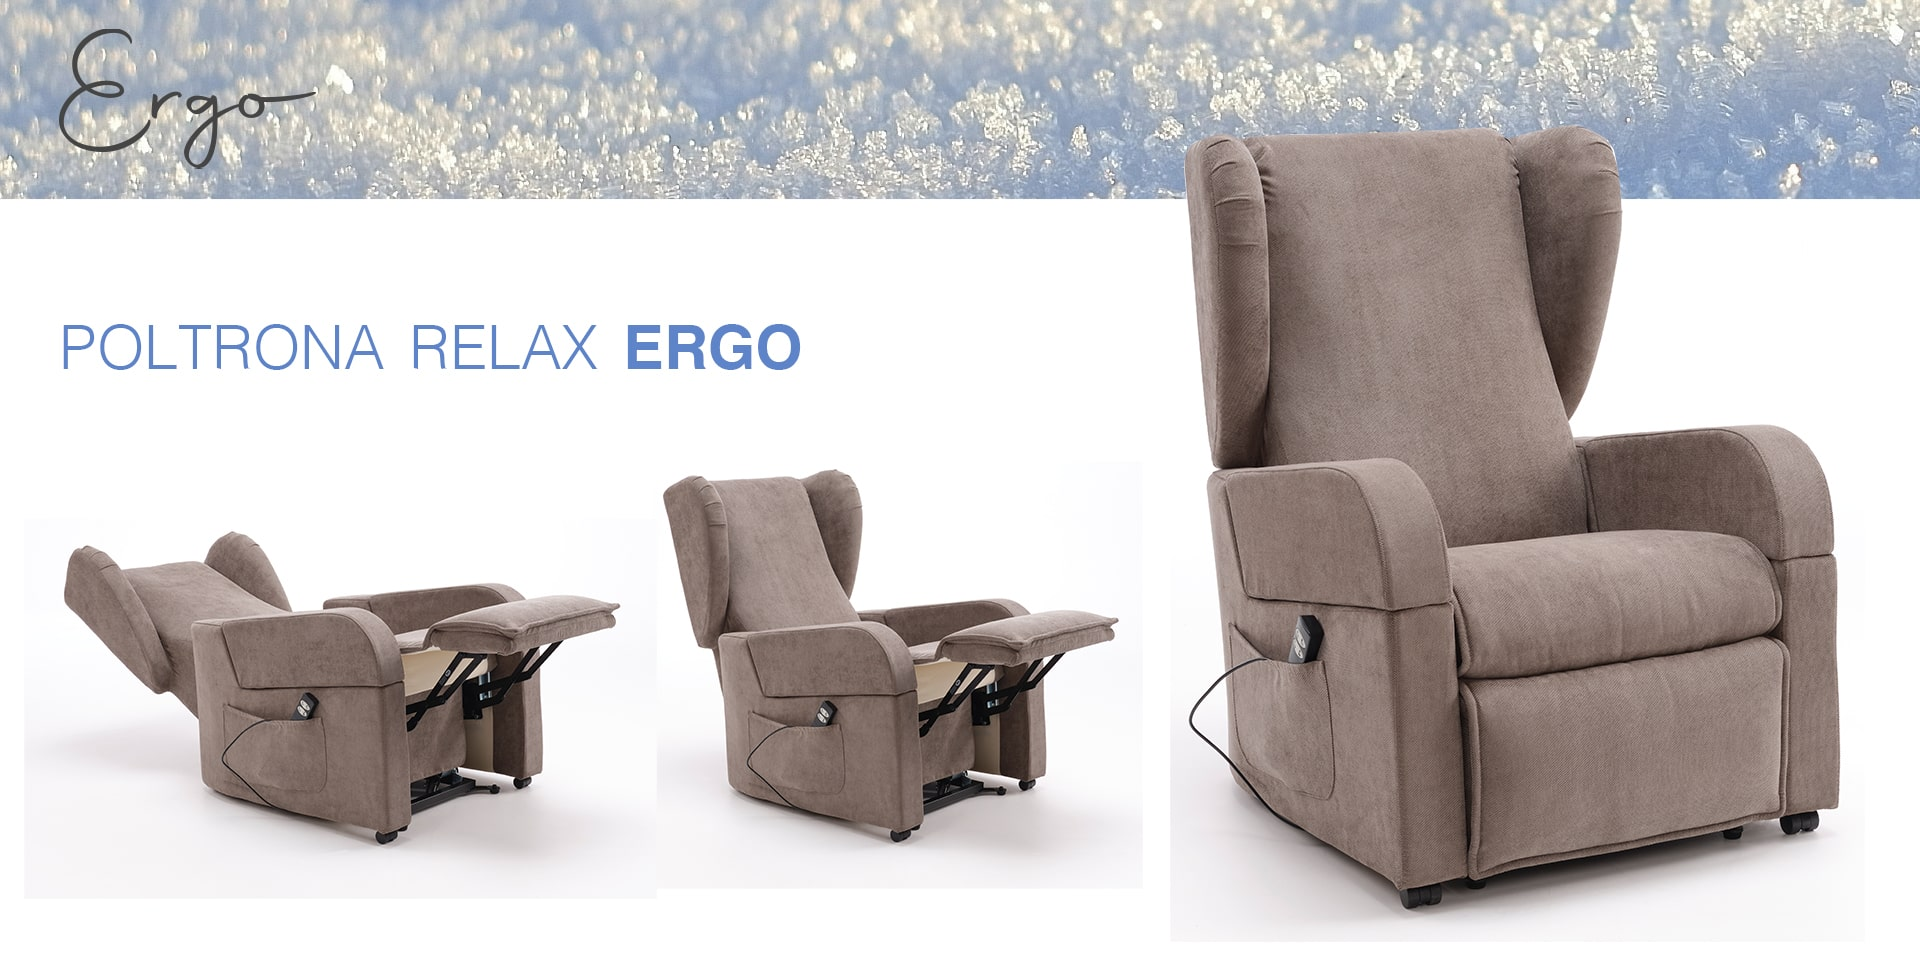 Poltrona relax Genesis Ergo